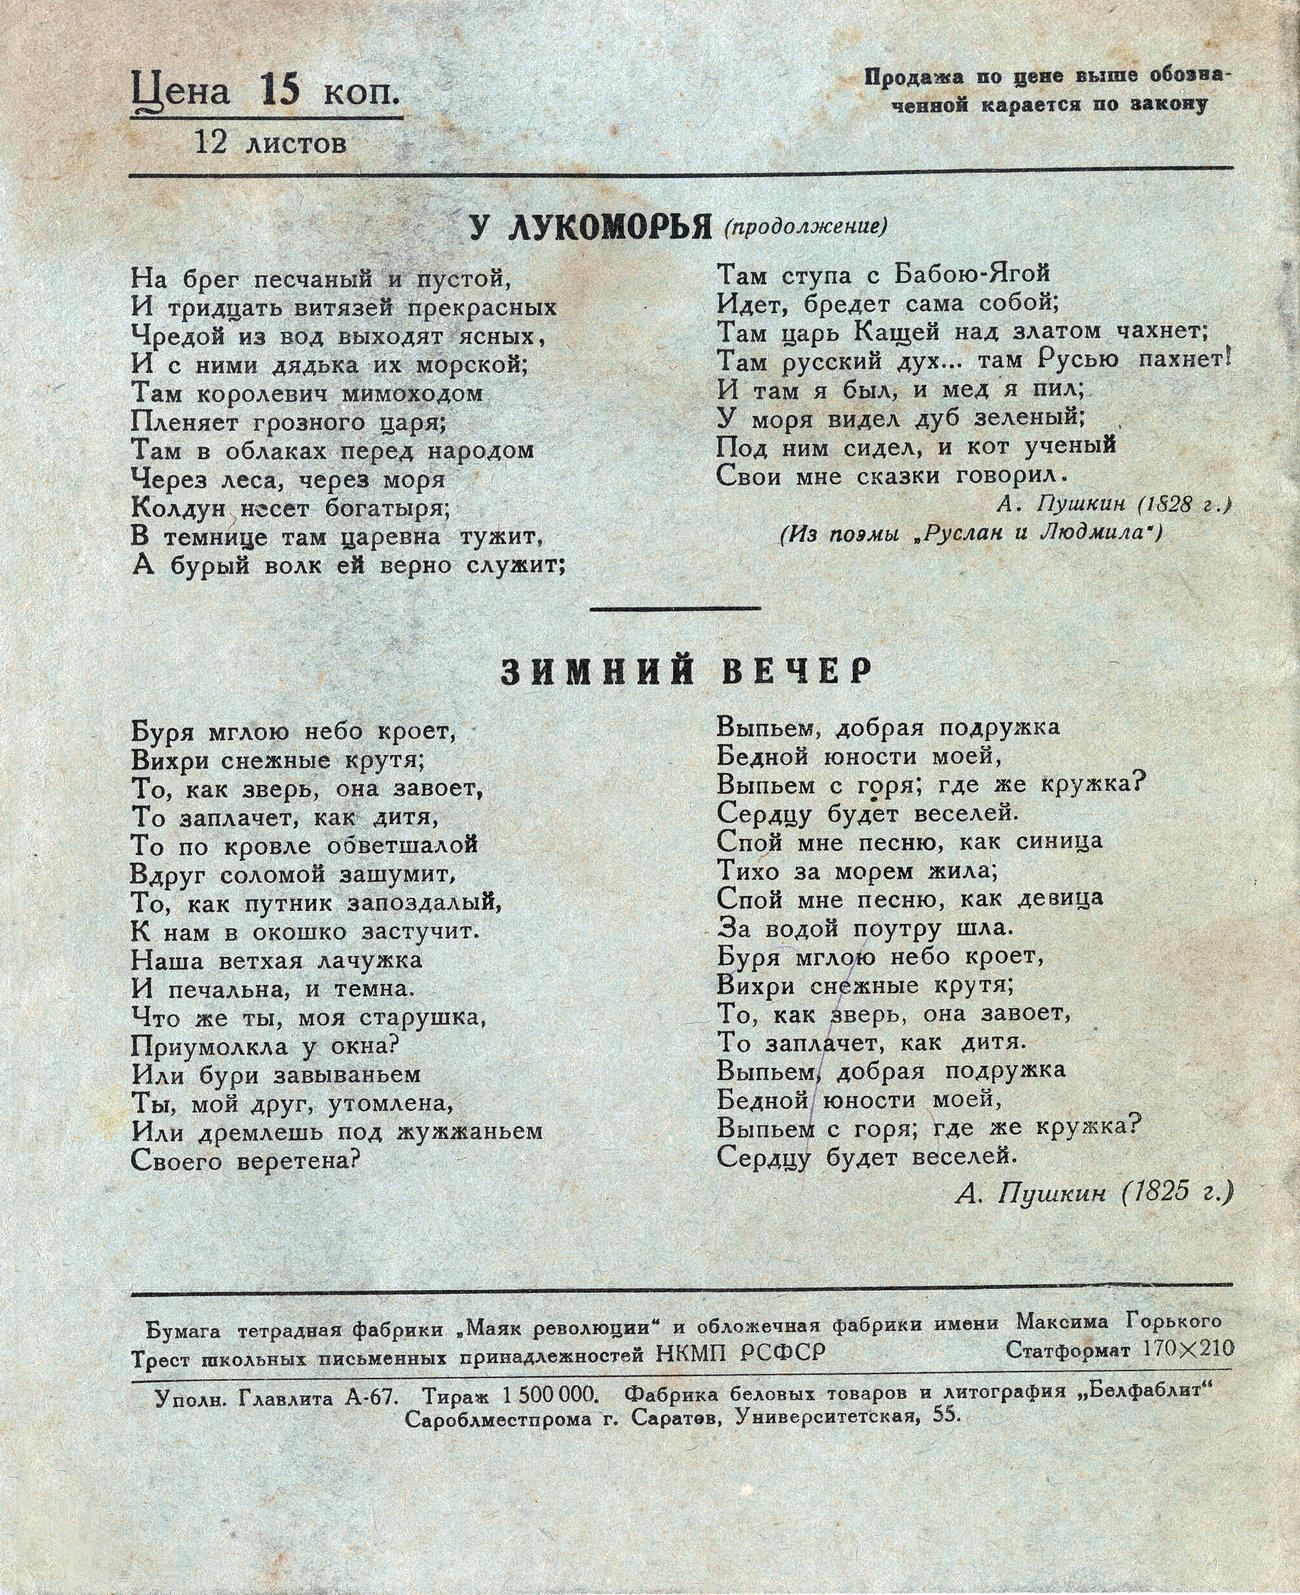 Тетрадь Пушкин (10), оборот